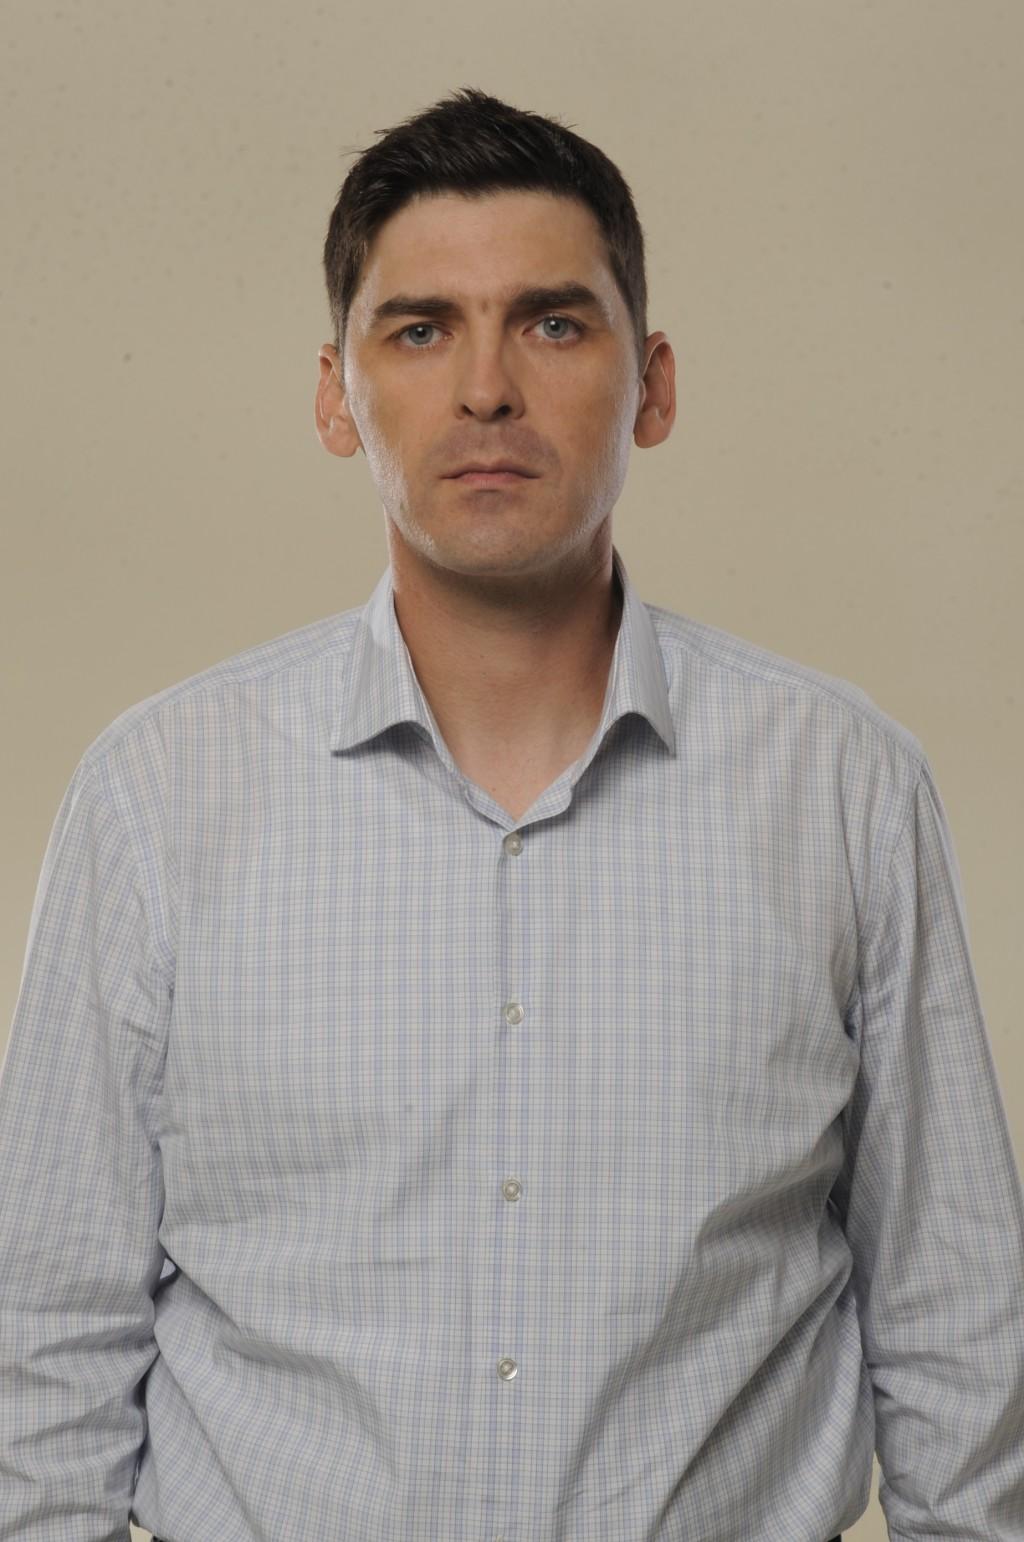 Dejan Prokic